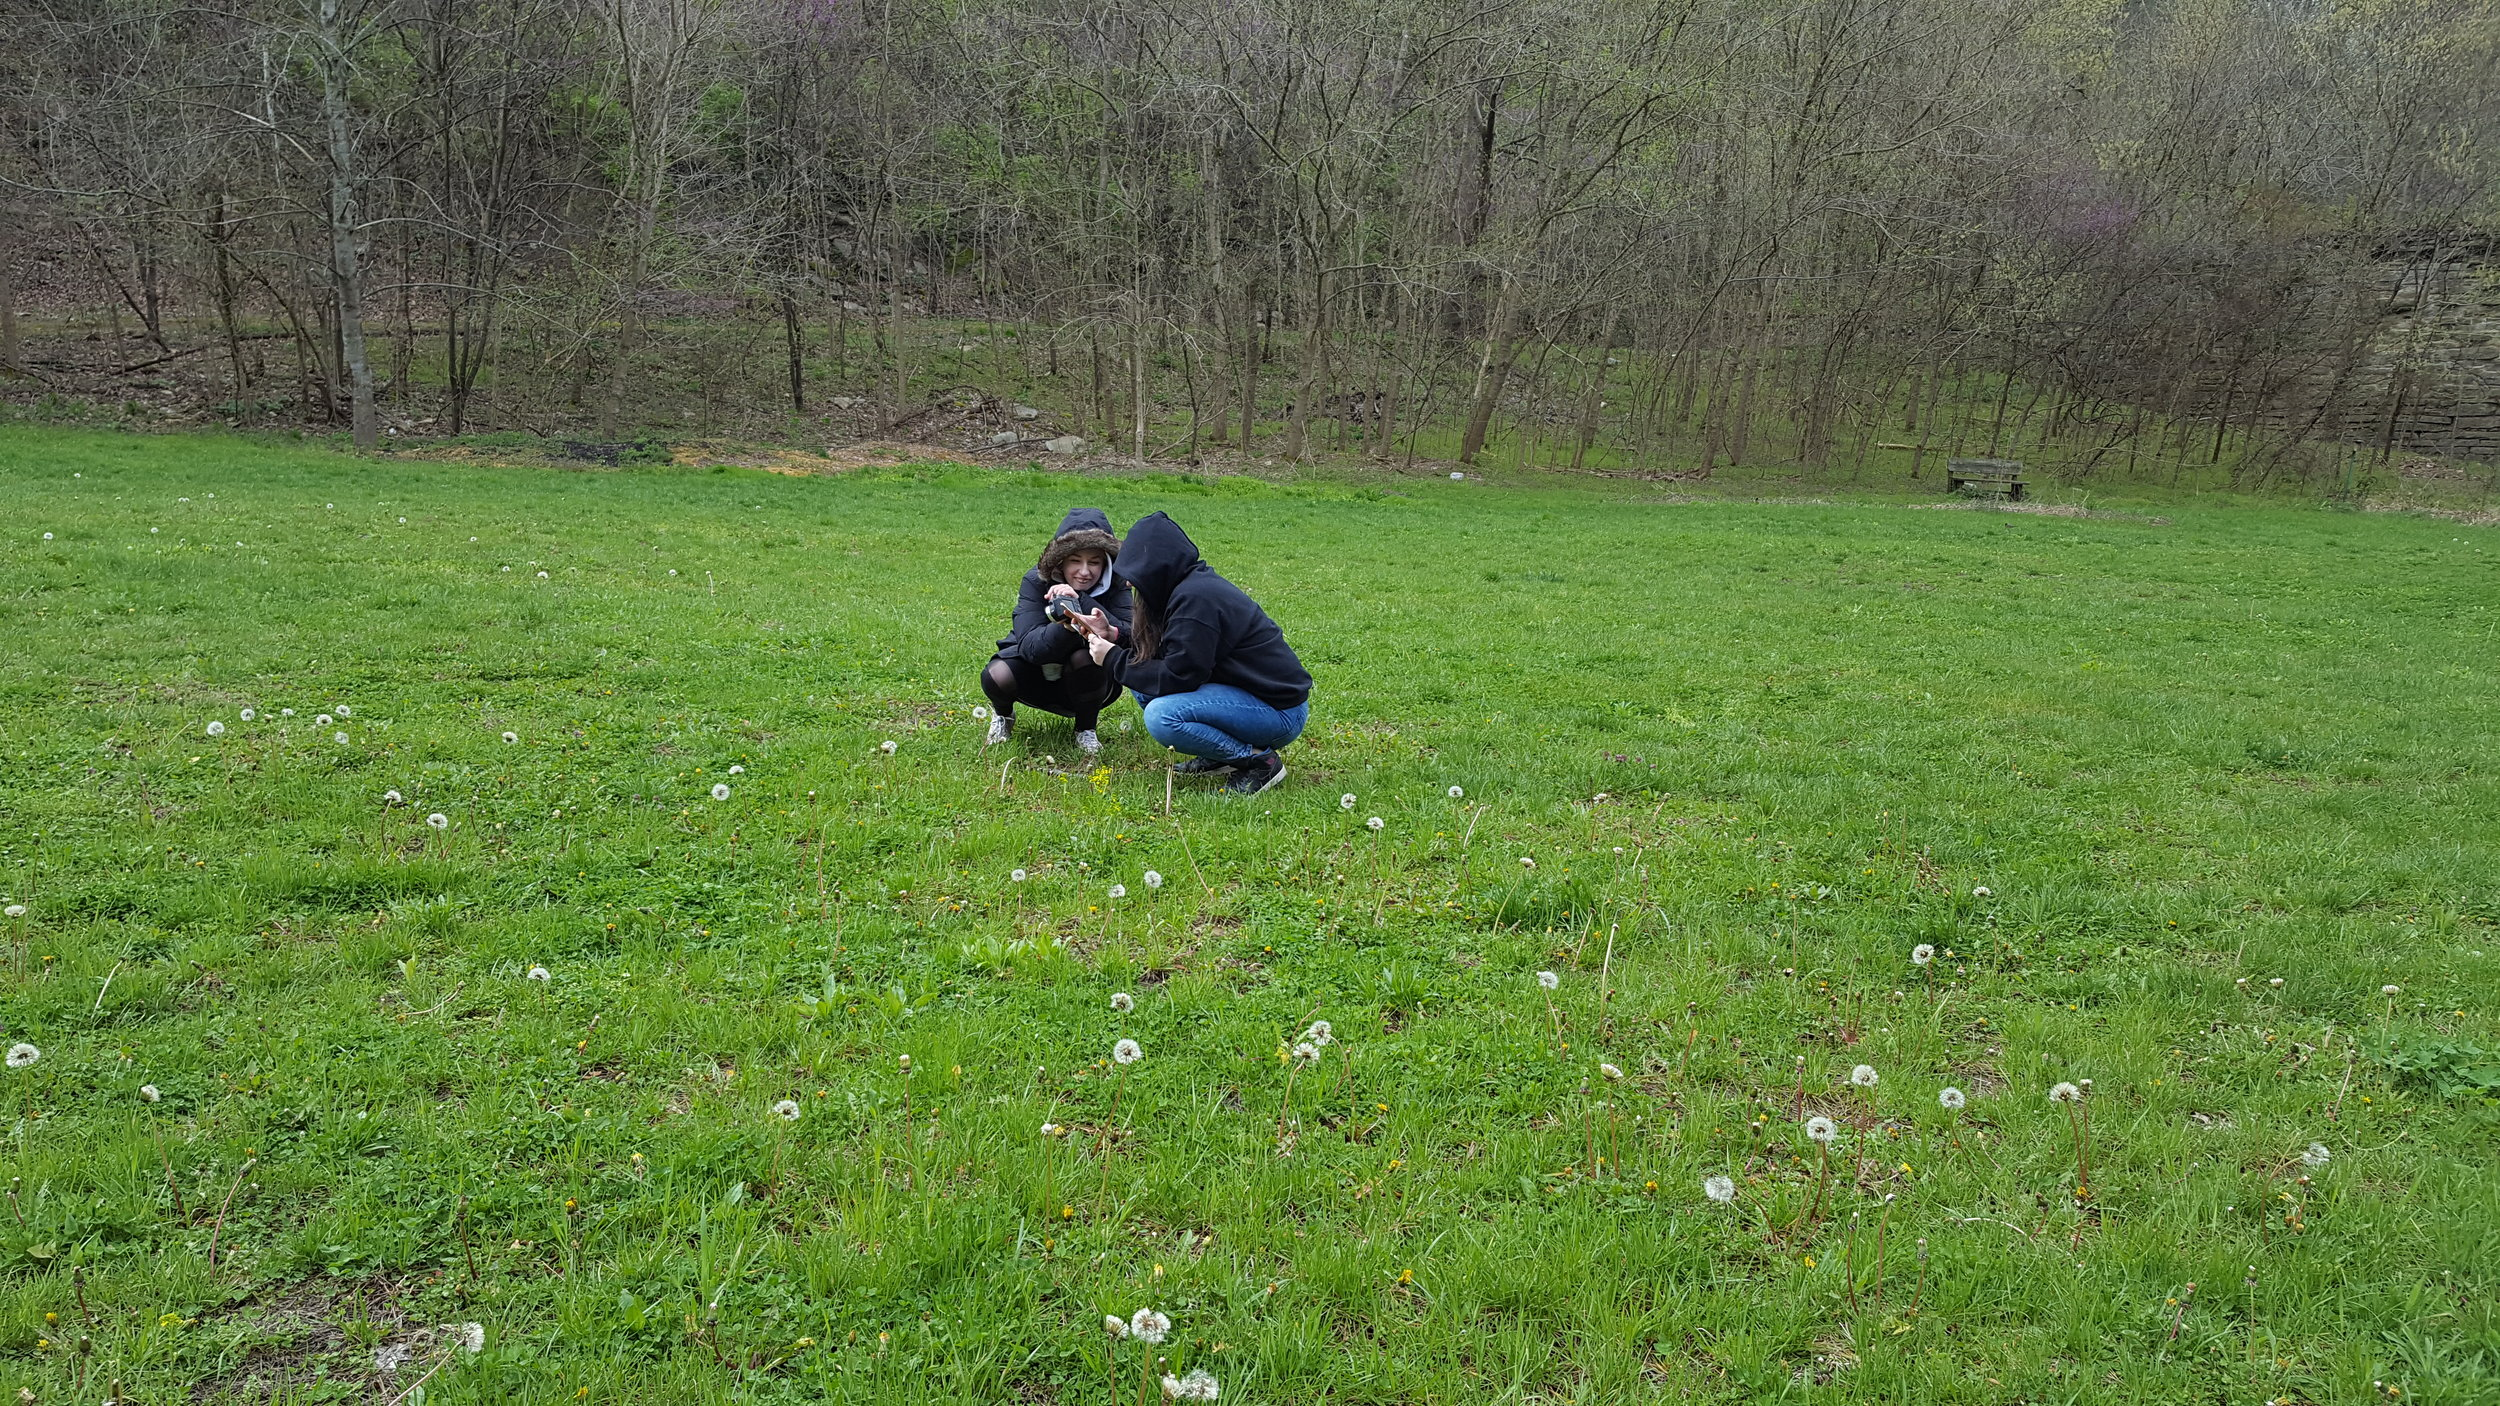 Squatting in a Field.jpg